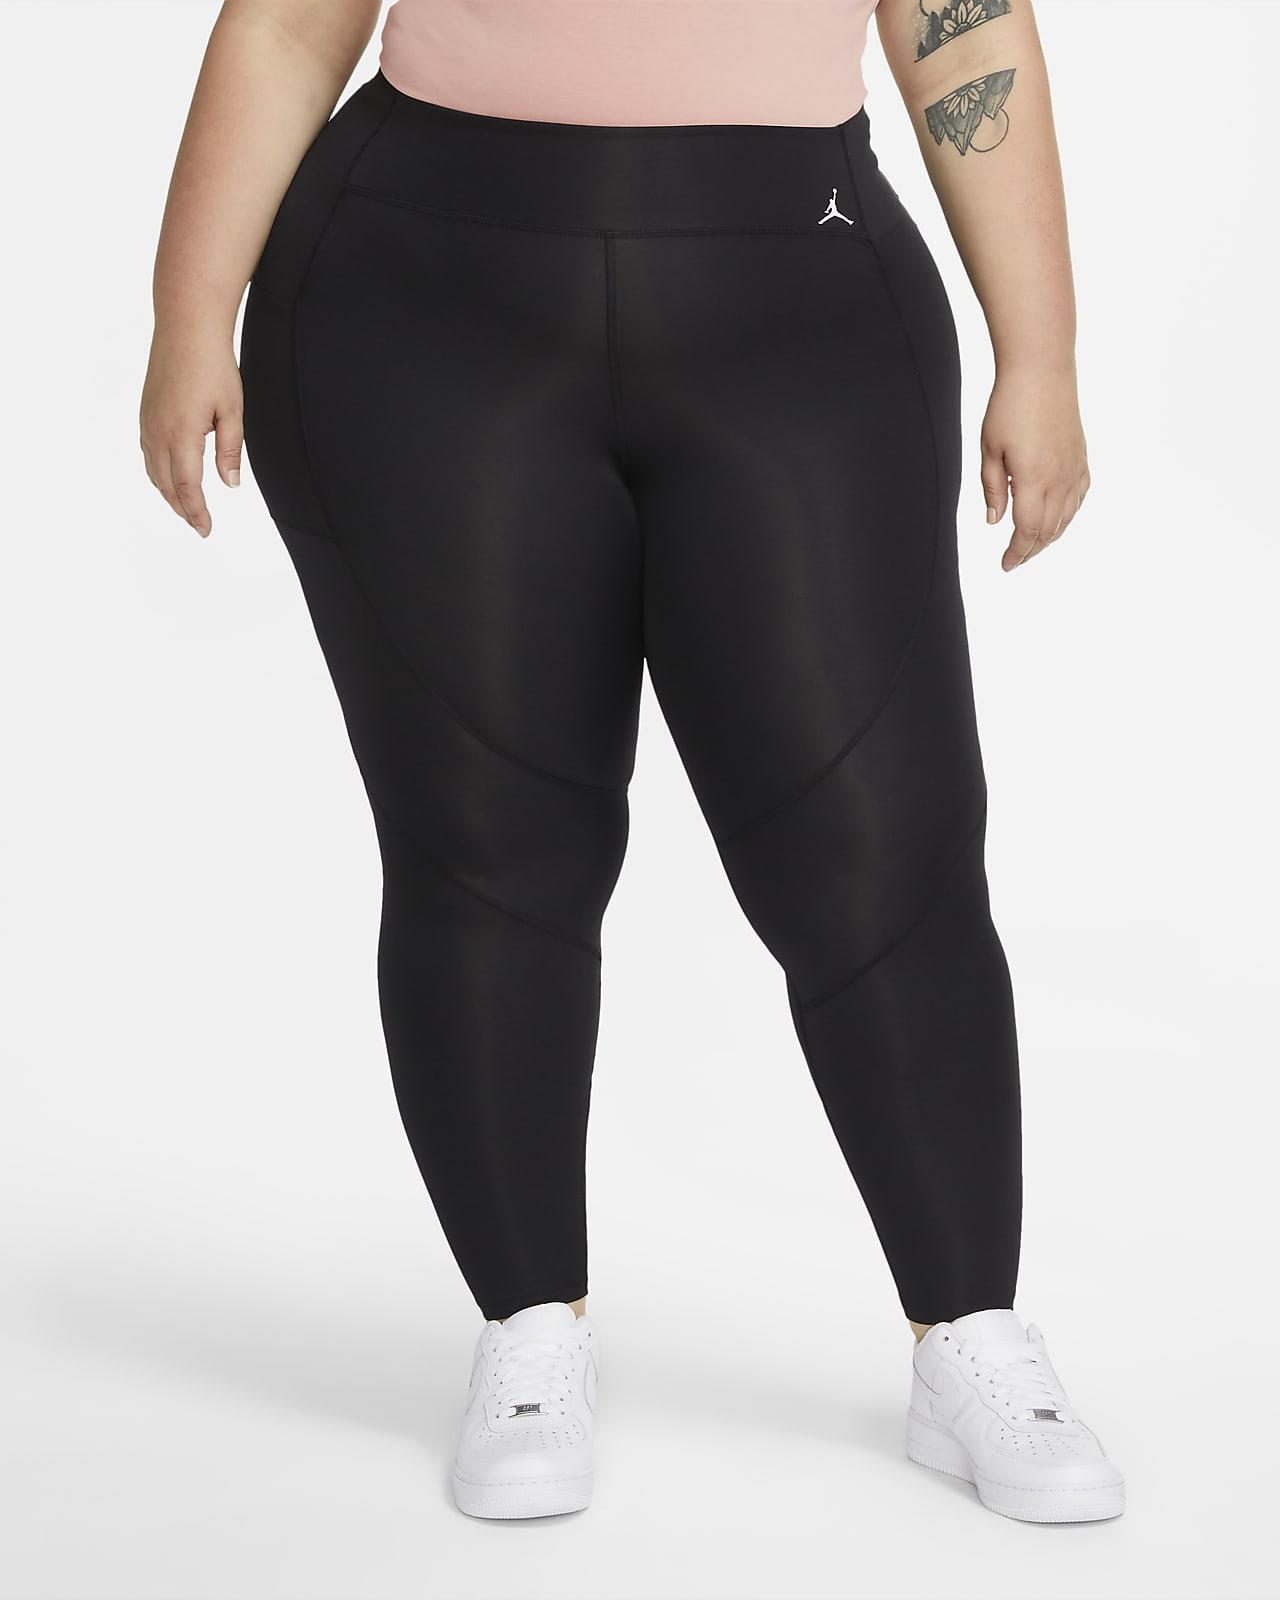 Jordan Essential Women's Mid-Rise 7/8 Leggings (Plus Size)